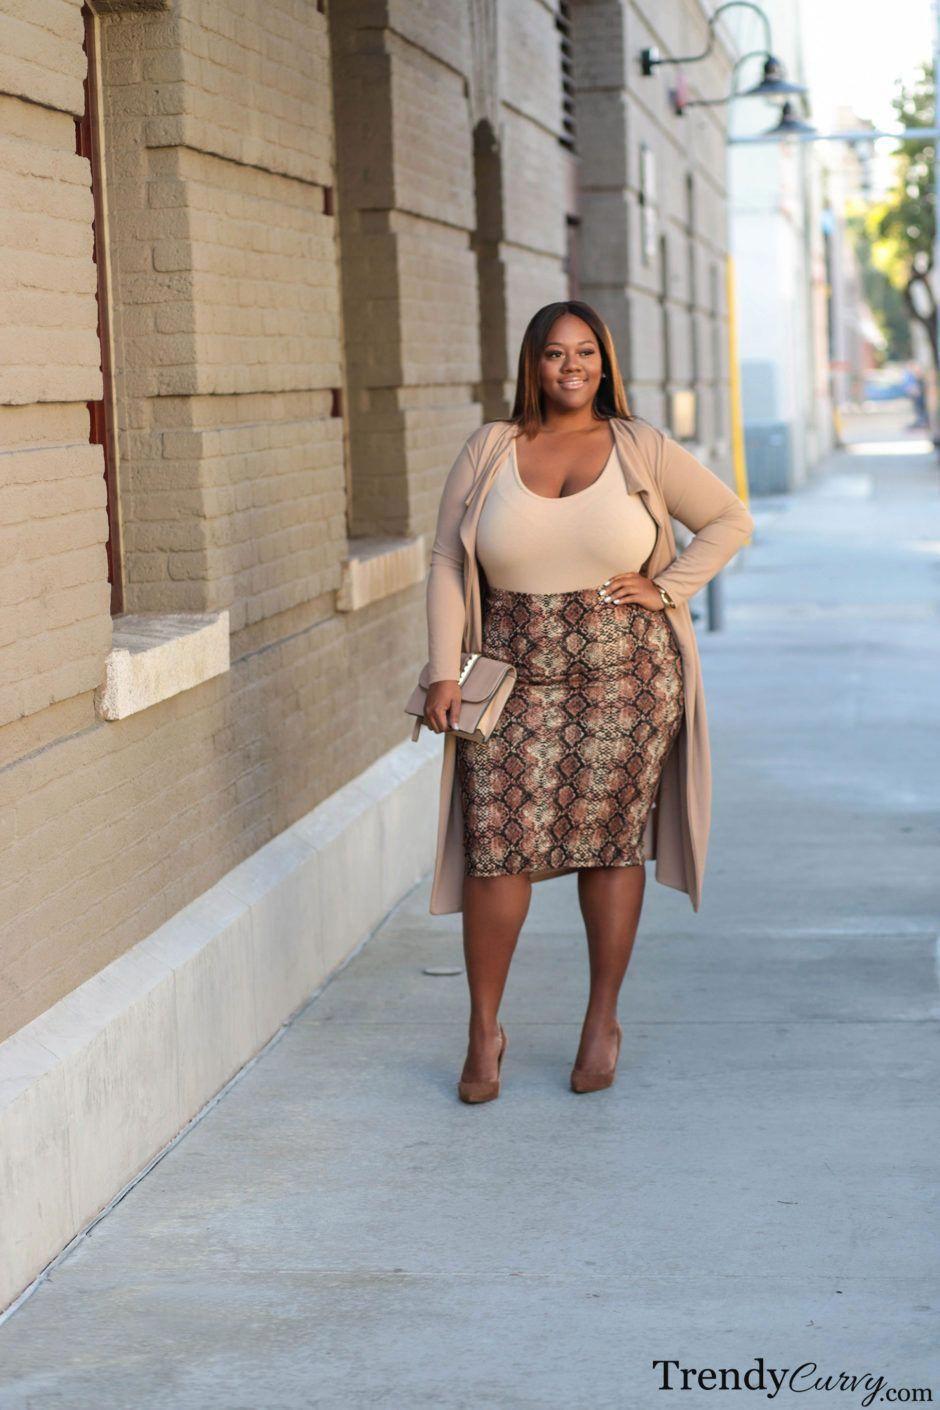 Women S Fashion On Pinterest Plus Size Fashion Plus Size Fashion Tips Plus Size Fall Outfit